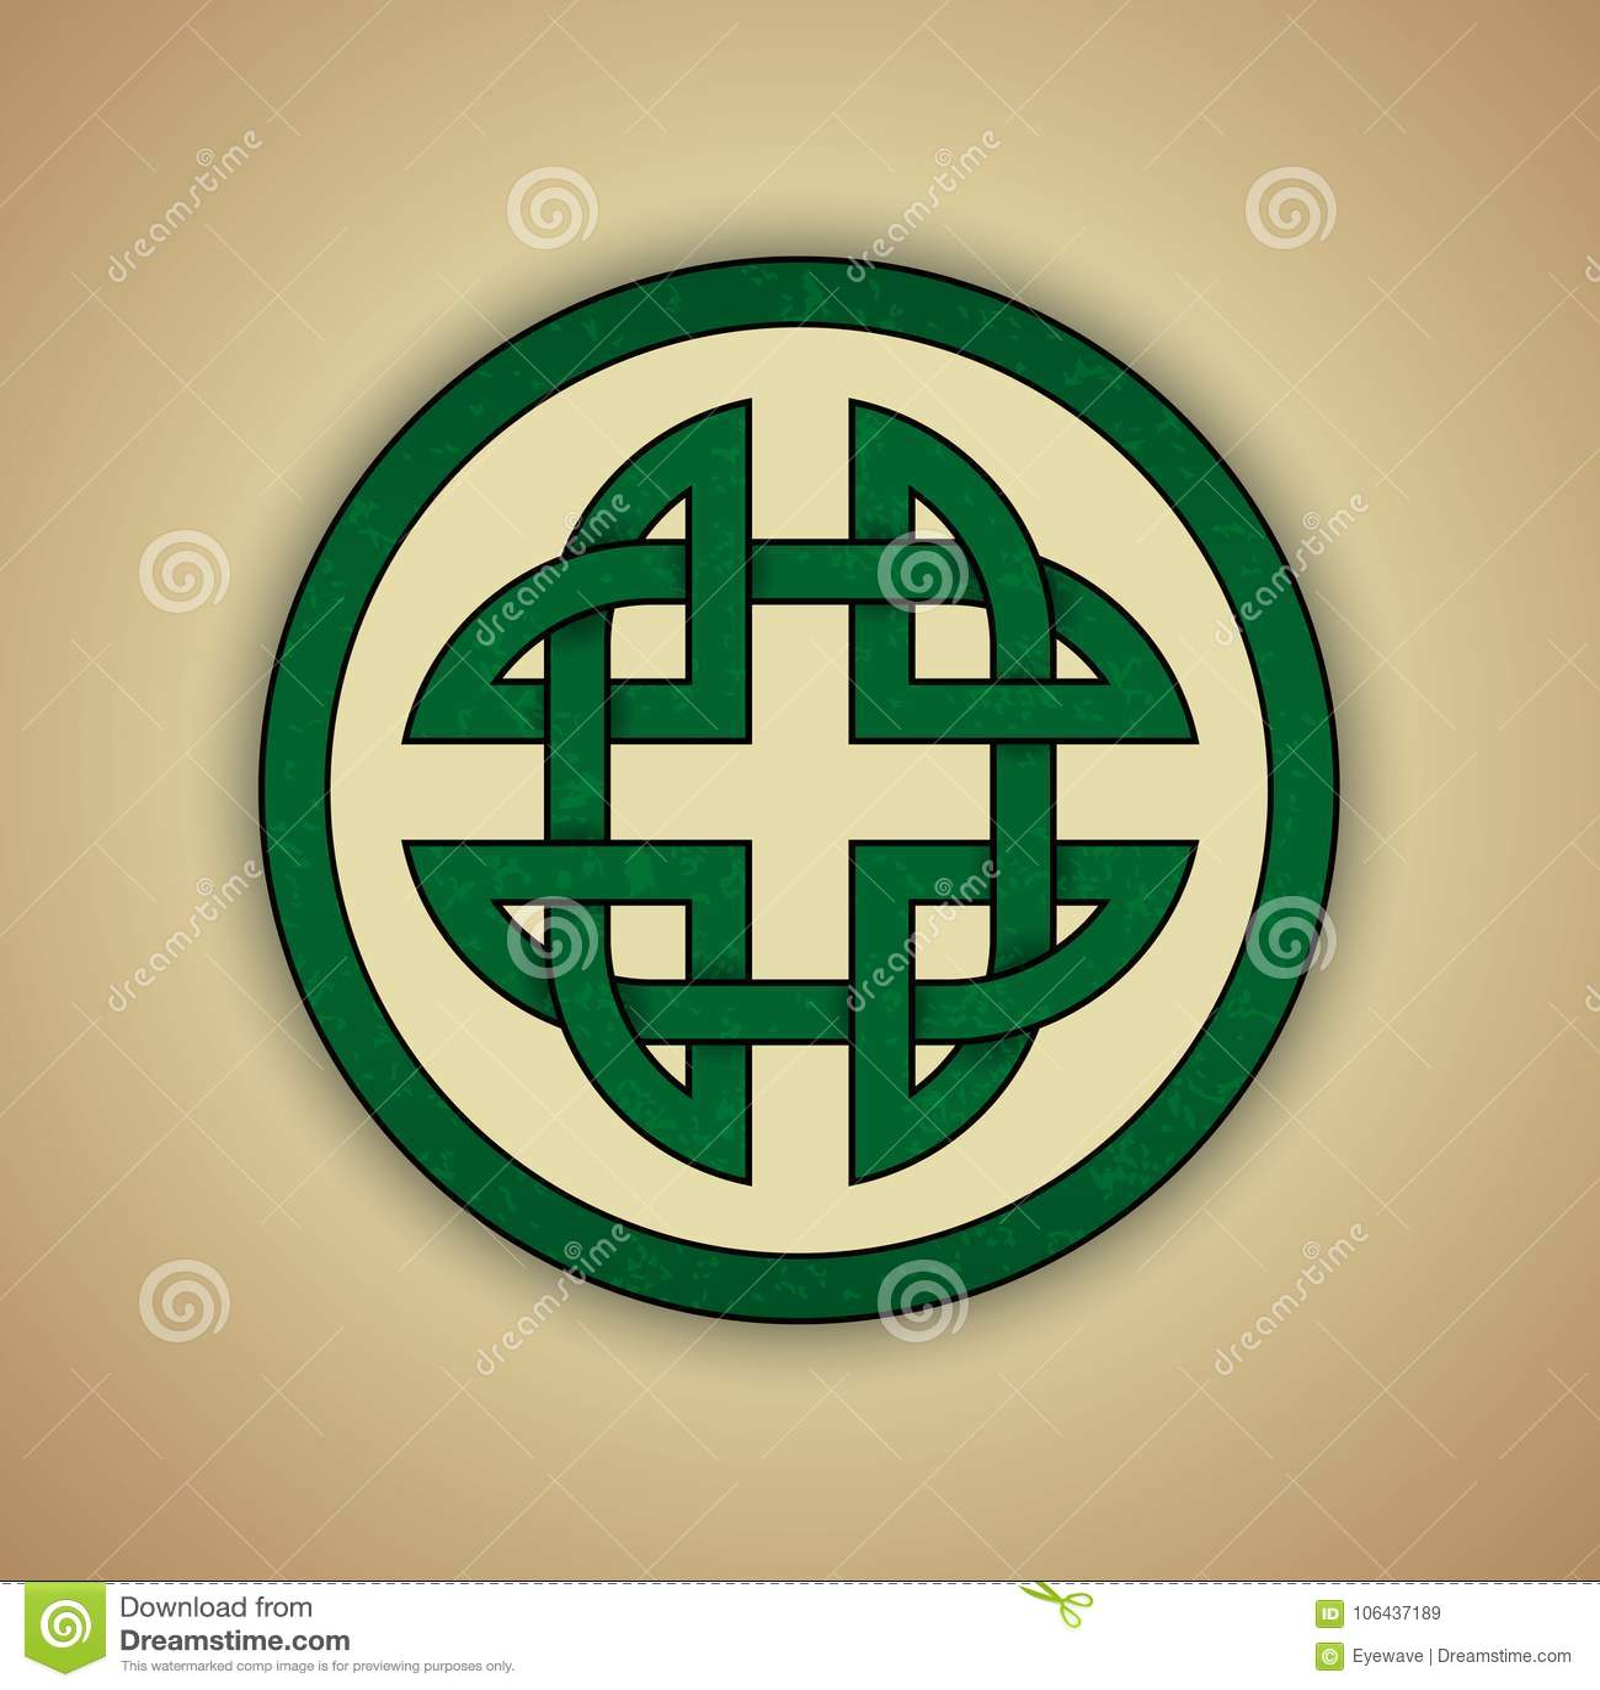 Celtic Knot Symbol Of Strength Stock Vector - Illustration ...